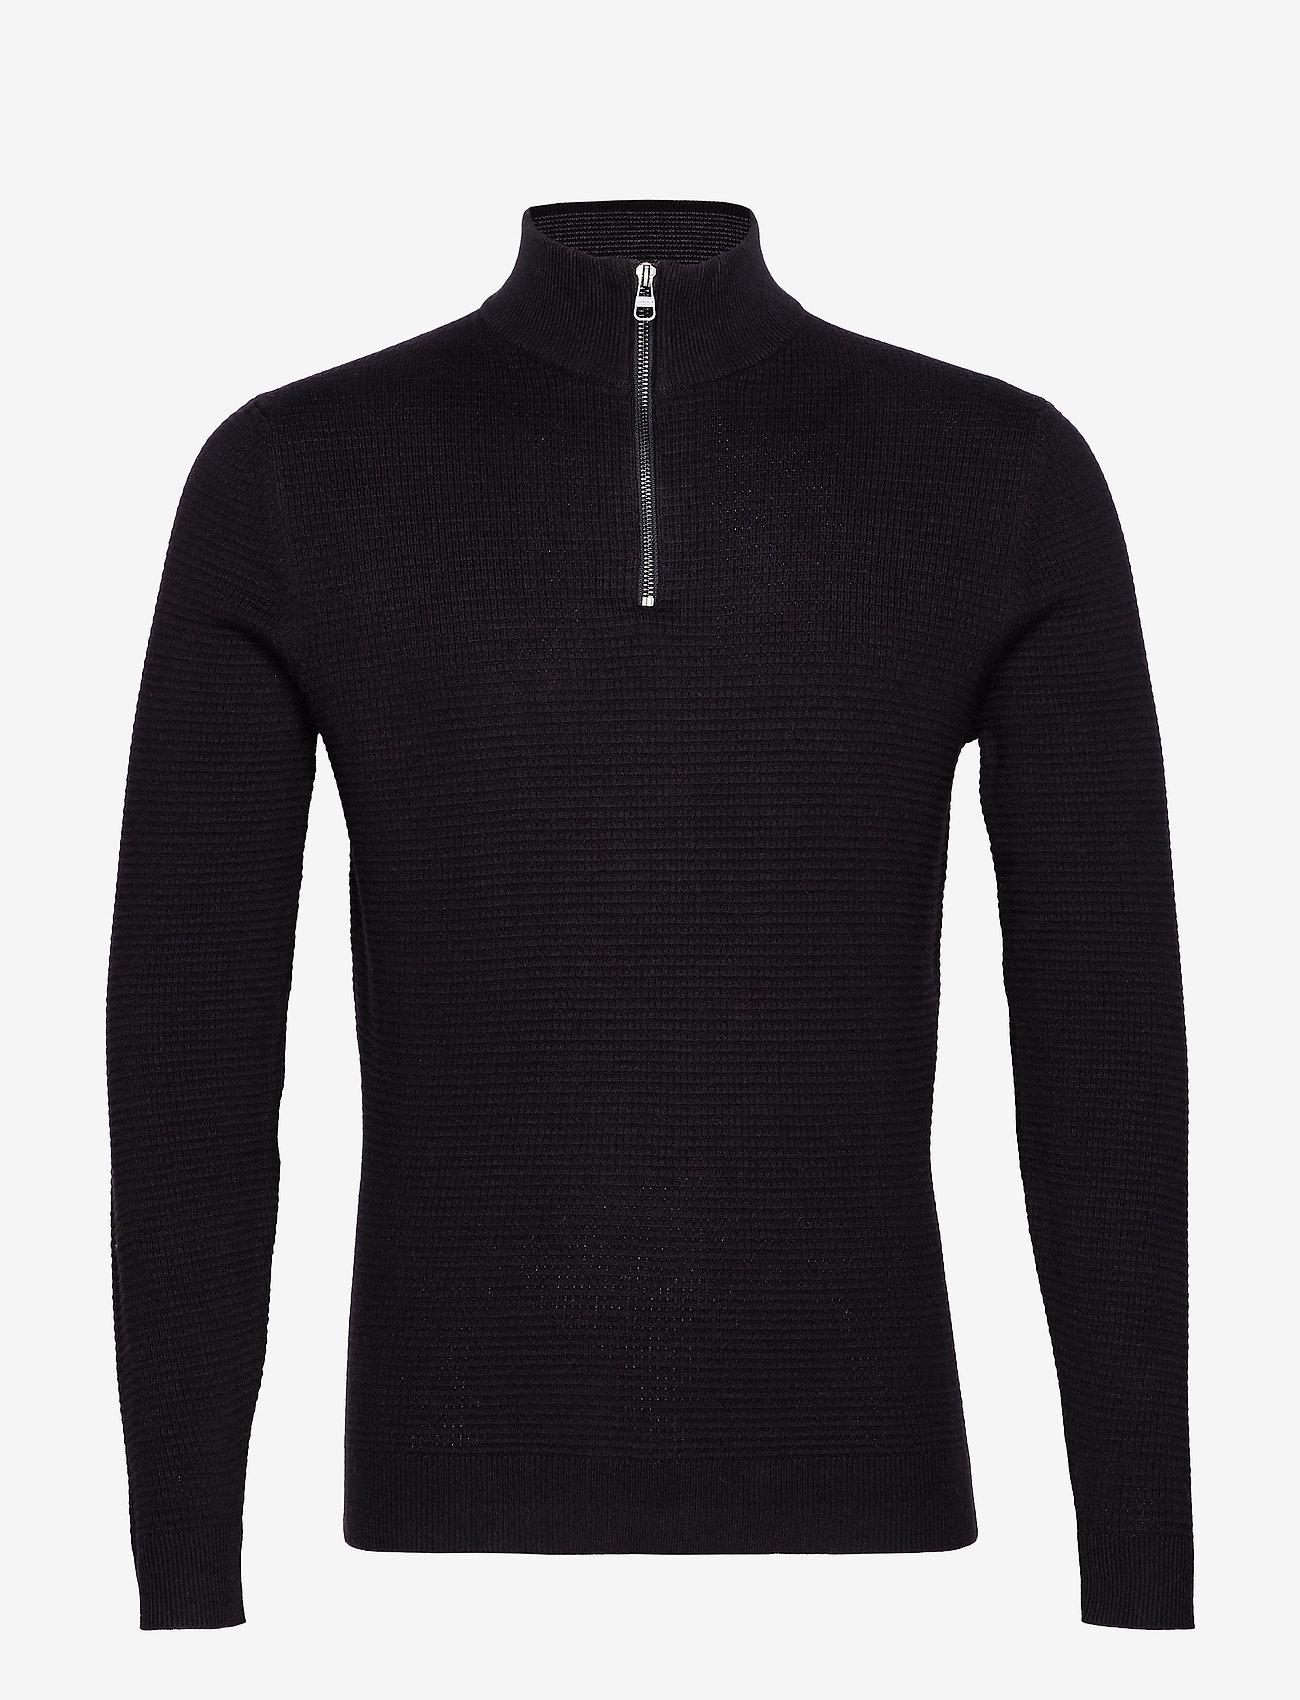 Esprit Casual - Sweaters - pulls demi-zip - black - 0